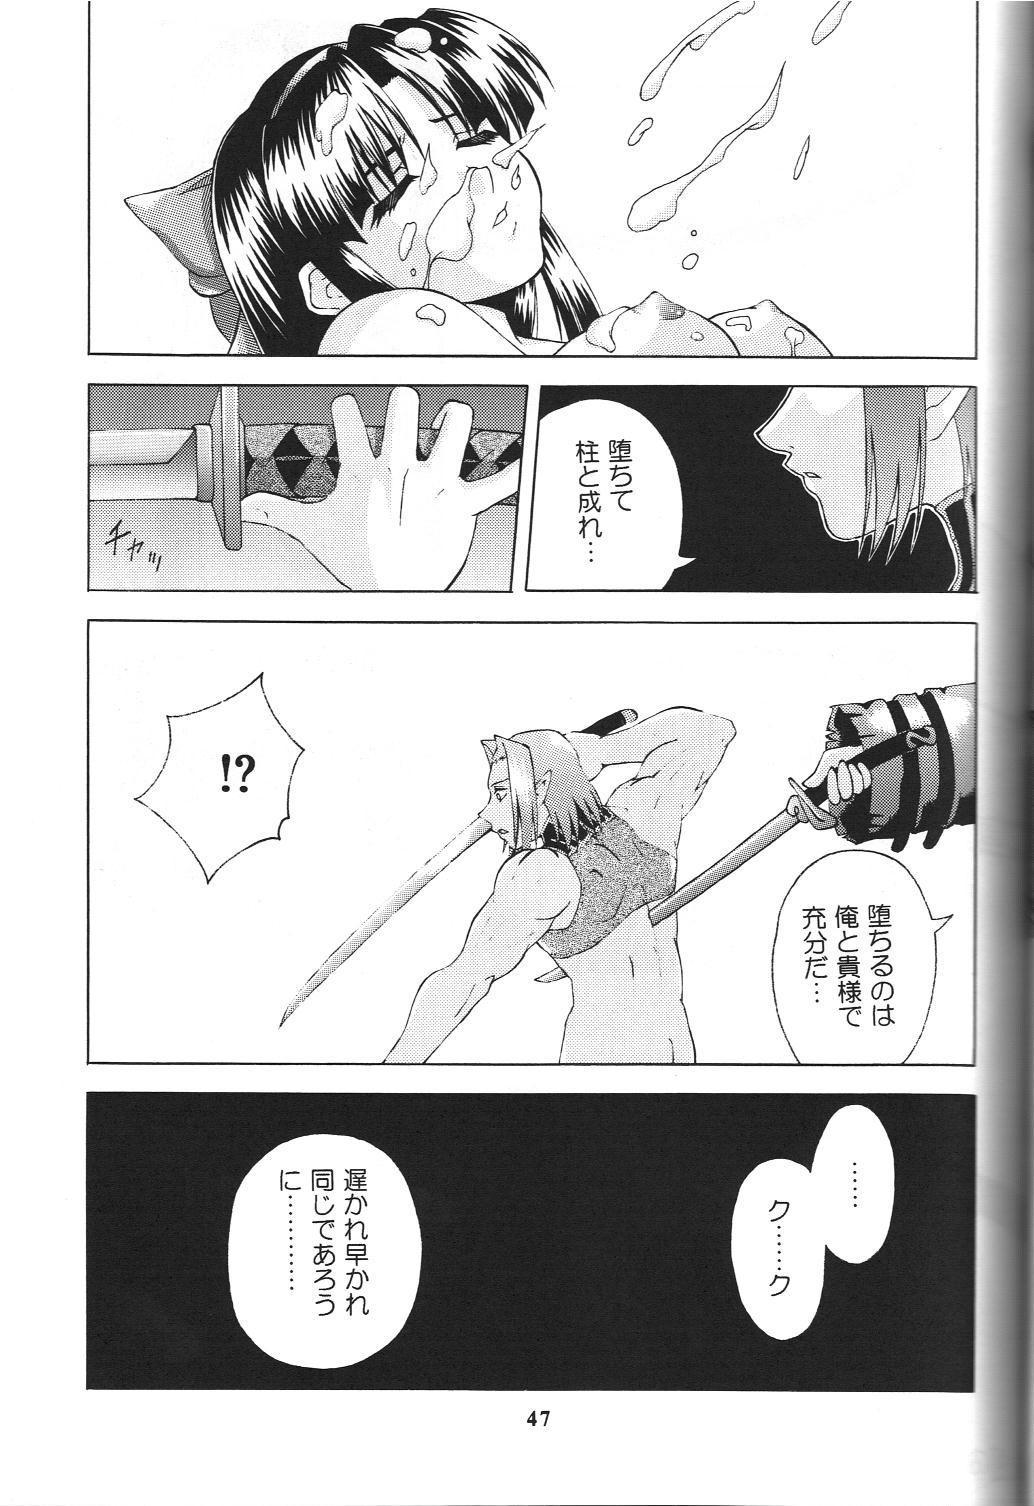 (C56) [Tsurikichi Doumei (Various)] Sengoku Rock - Nan Demo-R (Various) 47